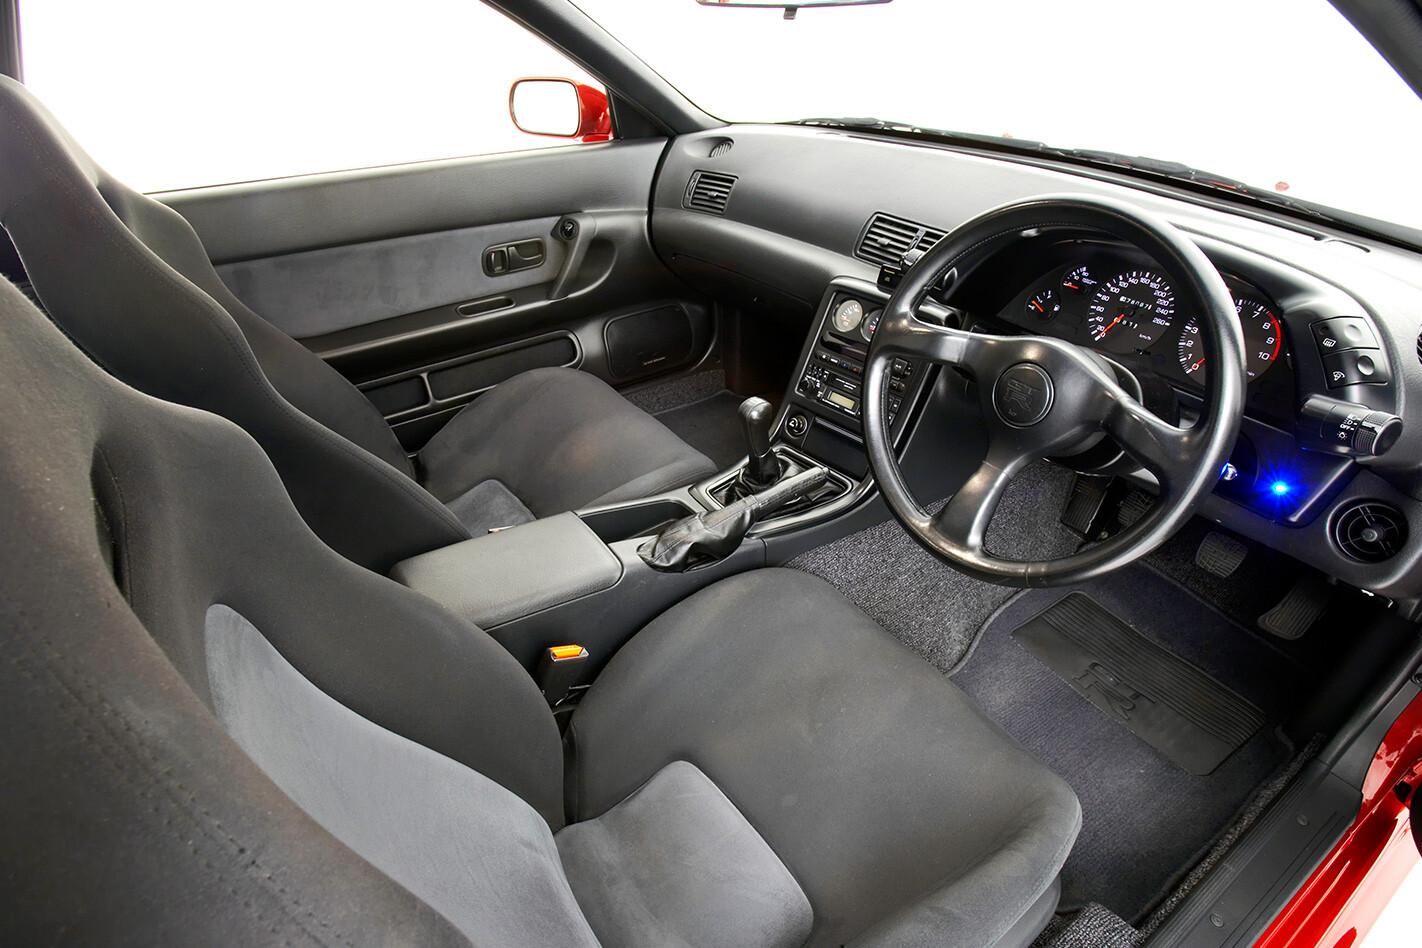 1991-Nissan-Skyline-GT-R-interior.jpg